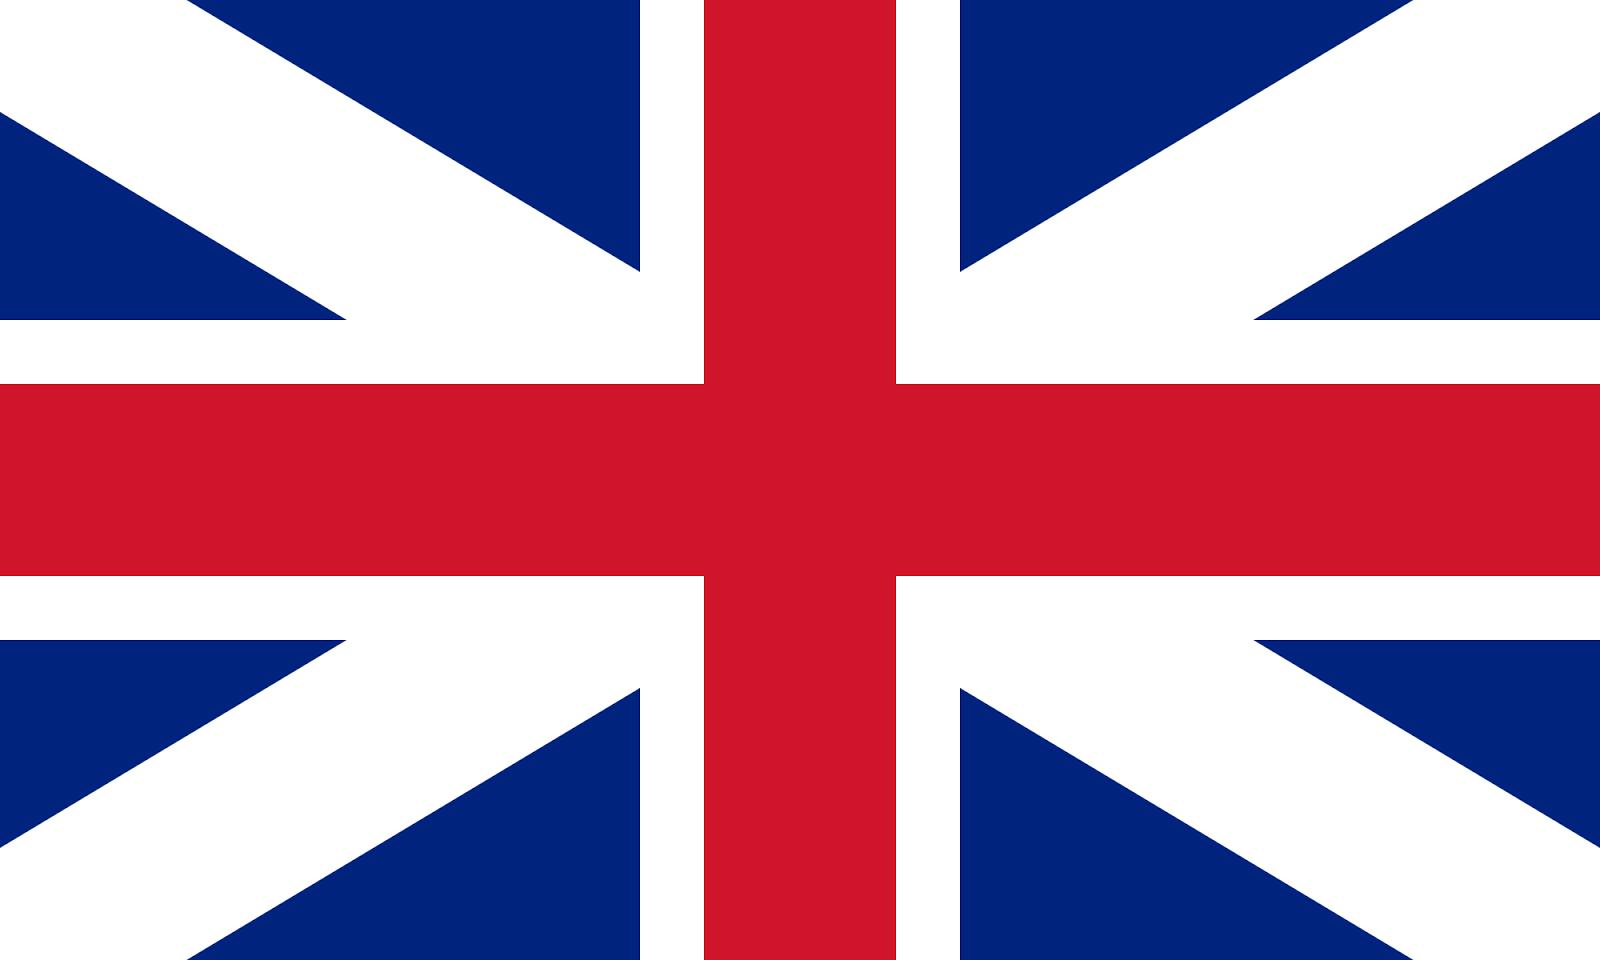 http://carbrandsincurrentproduction.blogspot.com.es/search/label/England